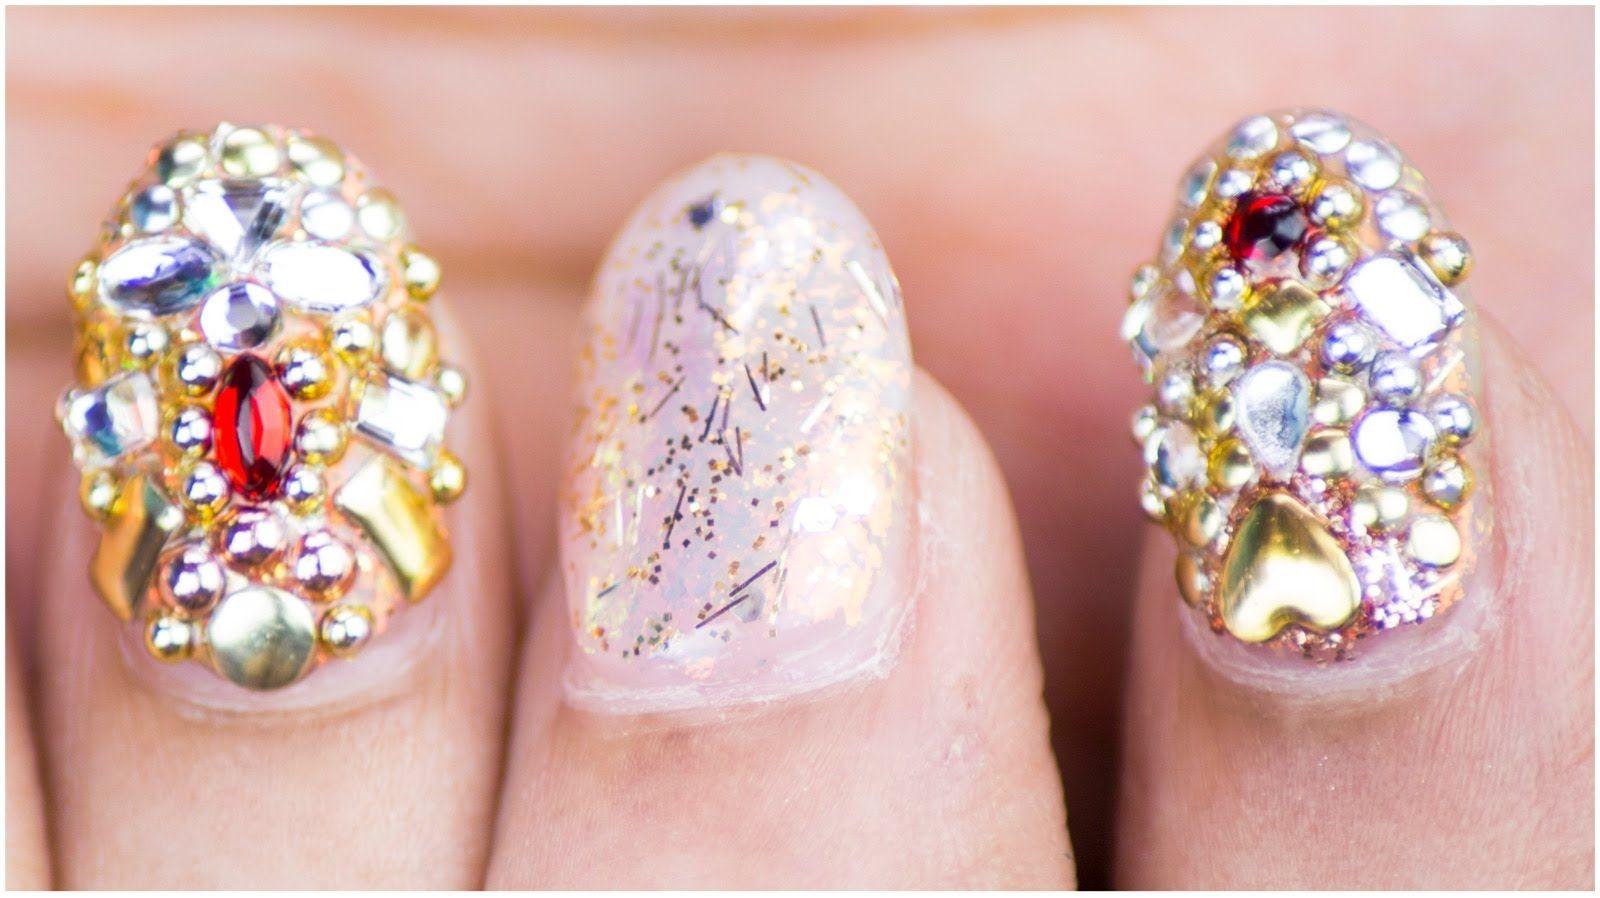 Jewel Nail Art Design | Sonal Sagaraya | #ChipperNails | Nail ...